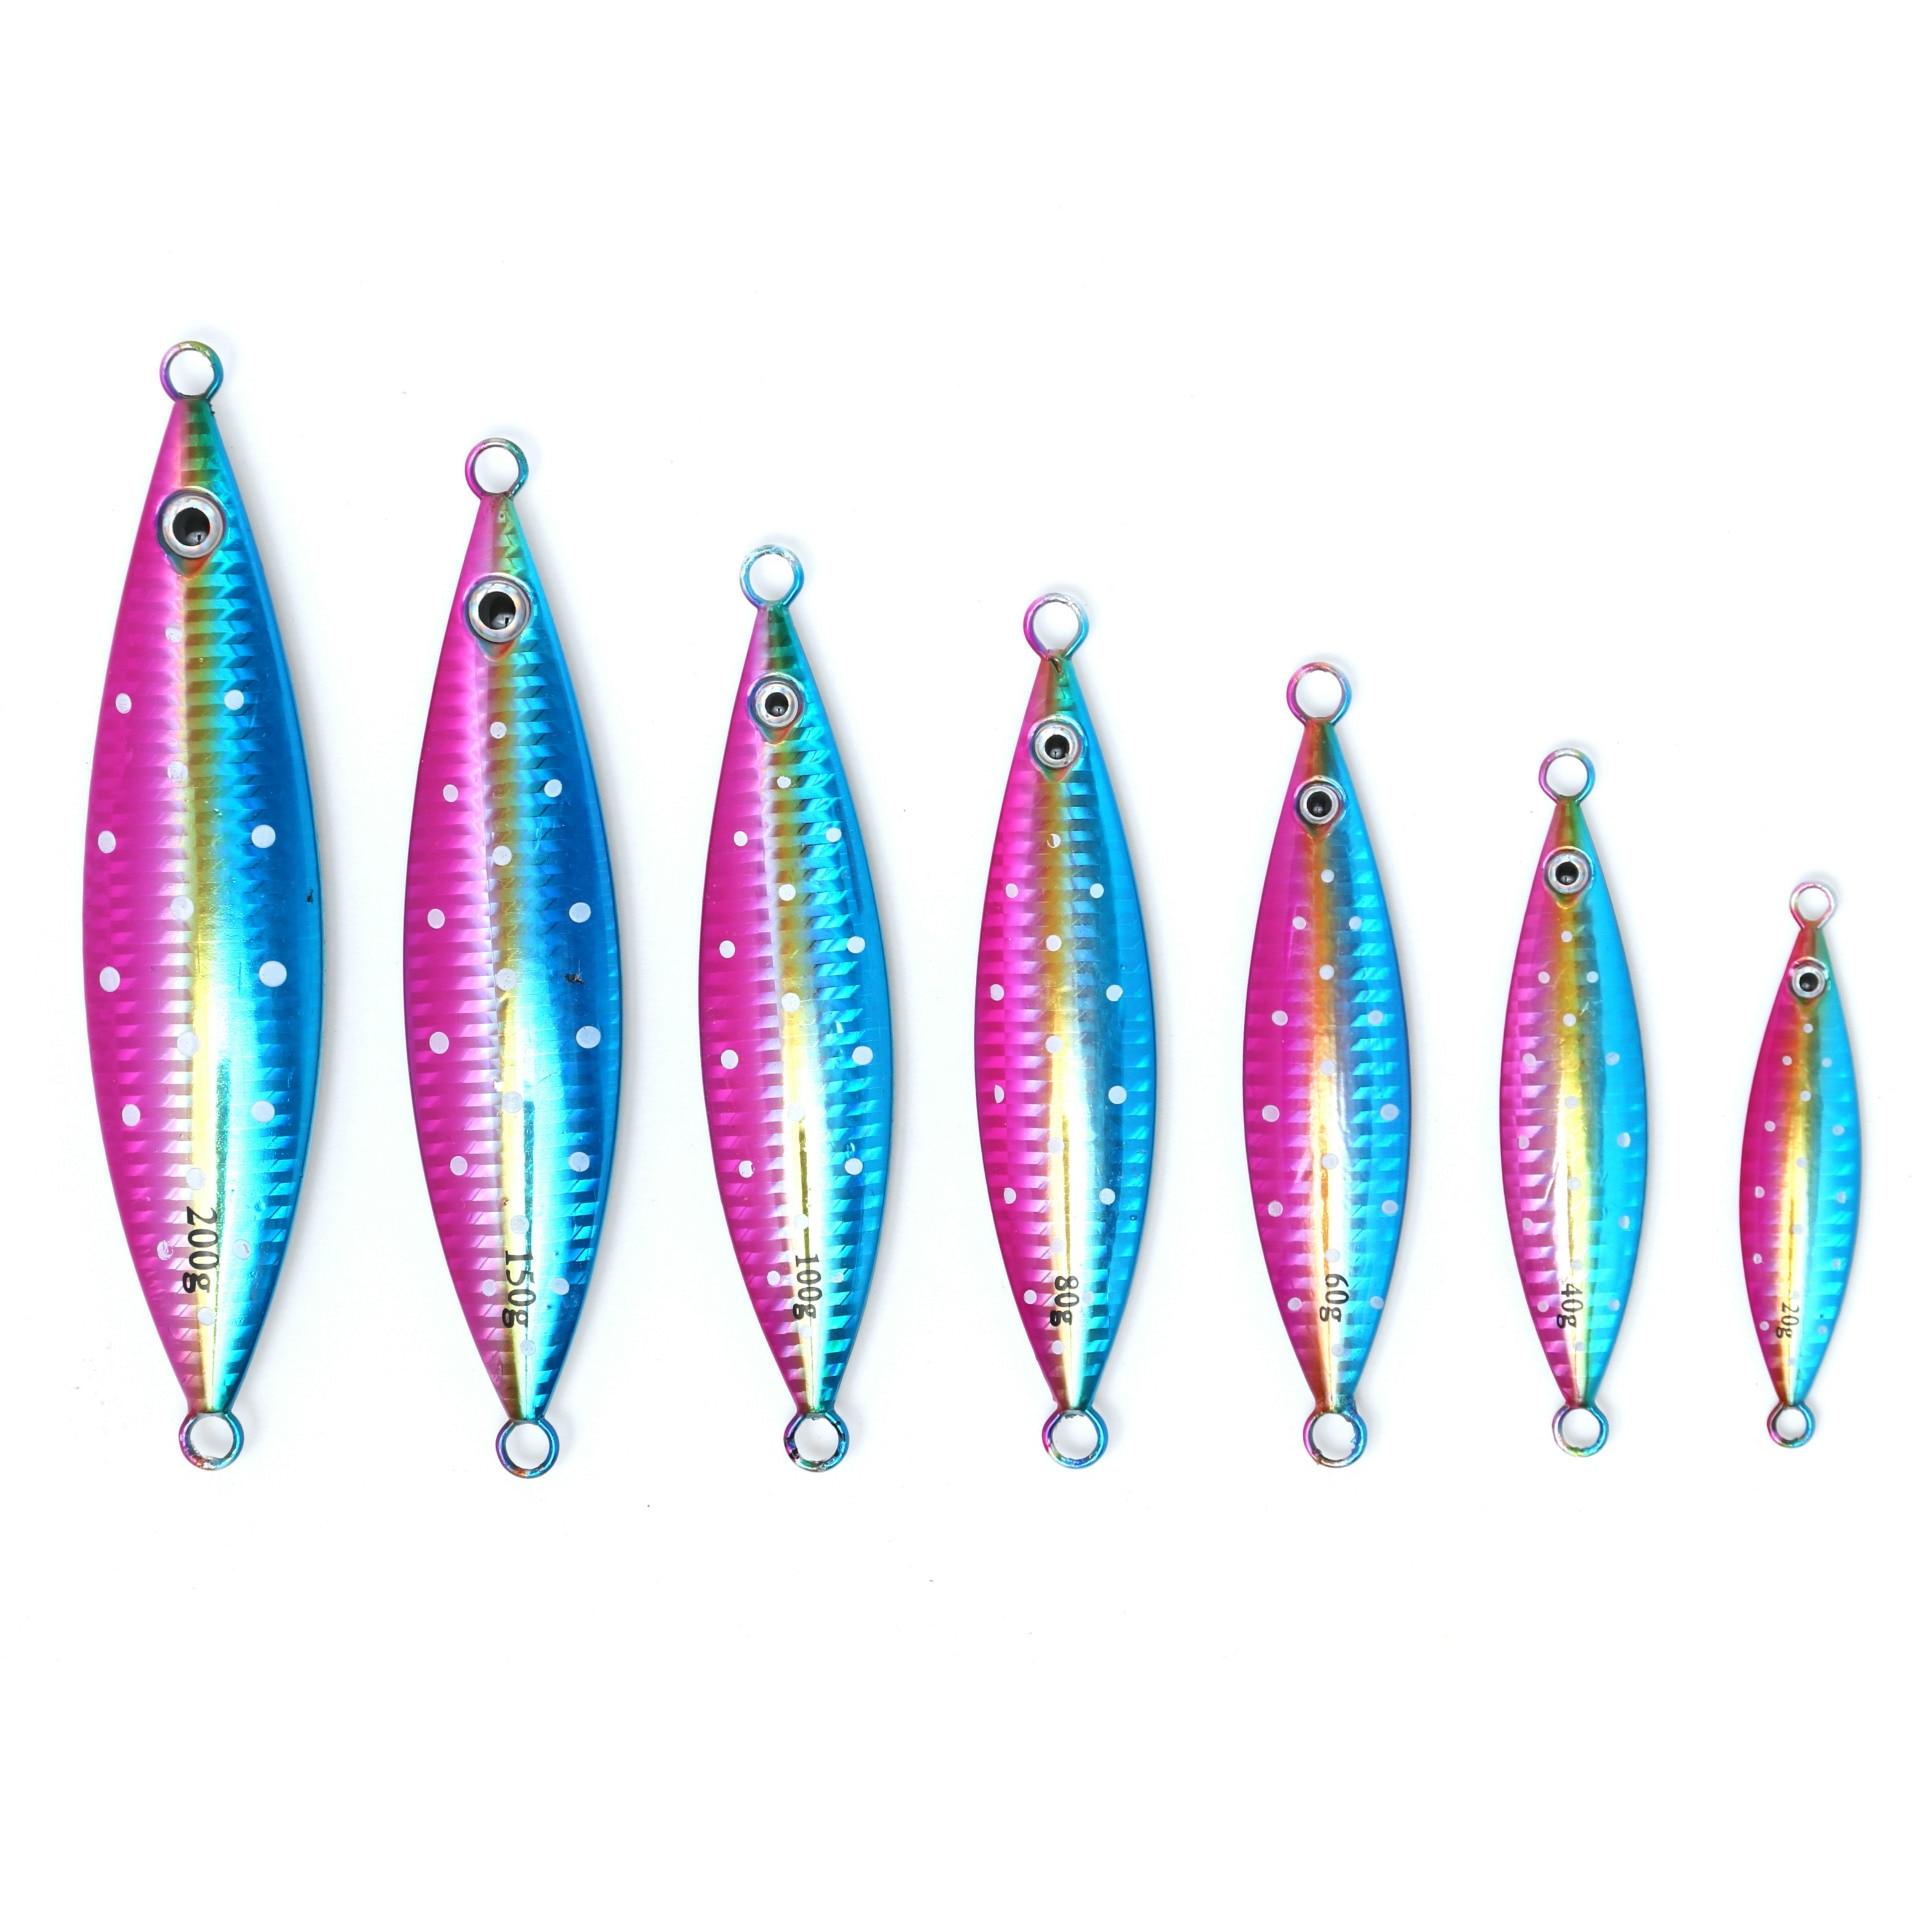 Anzhenji 4 pieces/lot Metal Fishing Lure Iron Plate Deep Sea Boat Pencil Jig Fishing Bait lead fish 20g-200g Peche